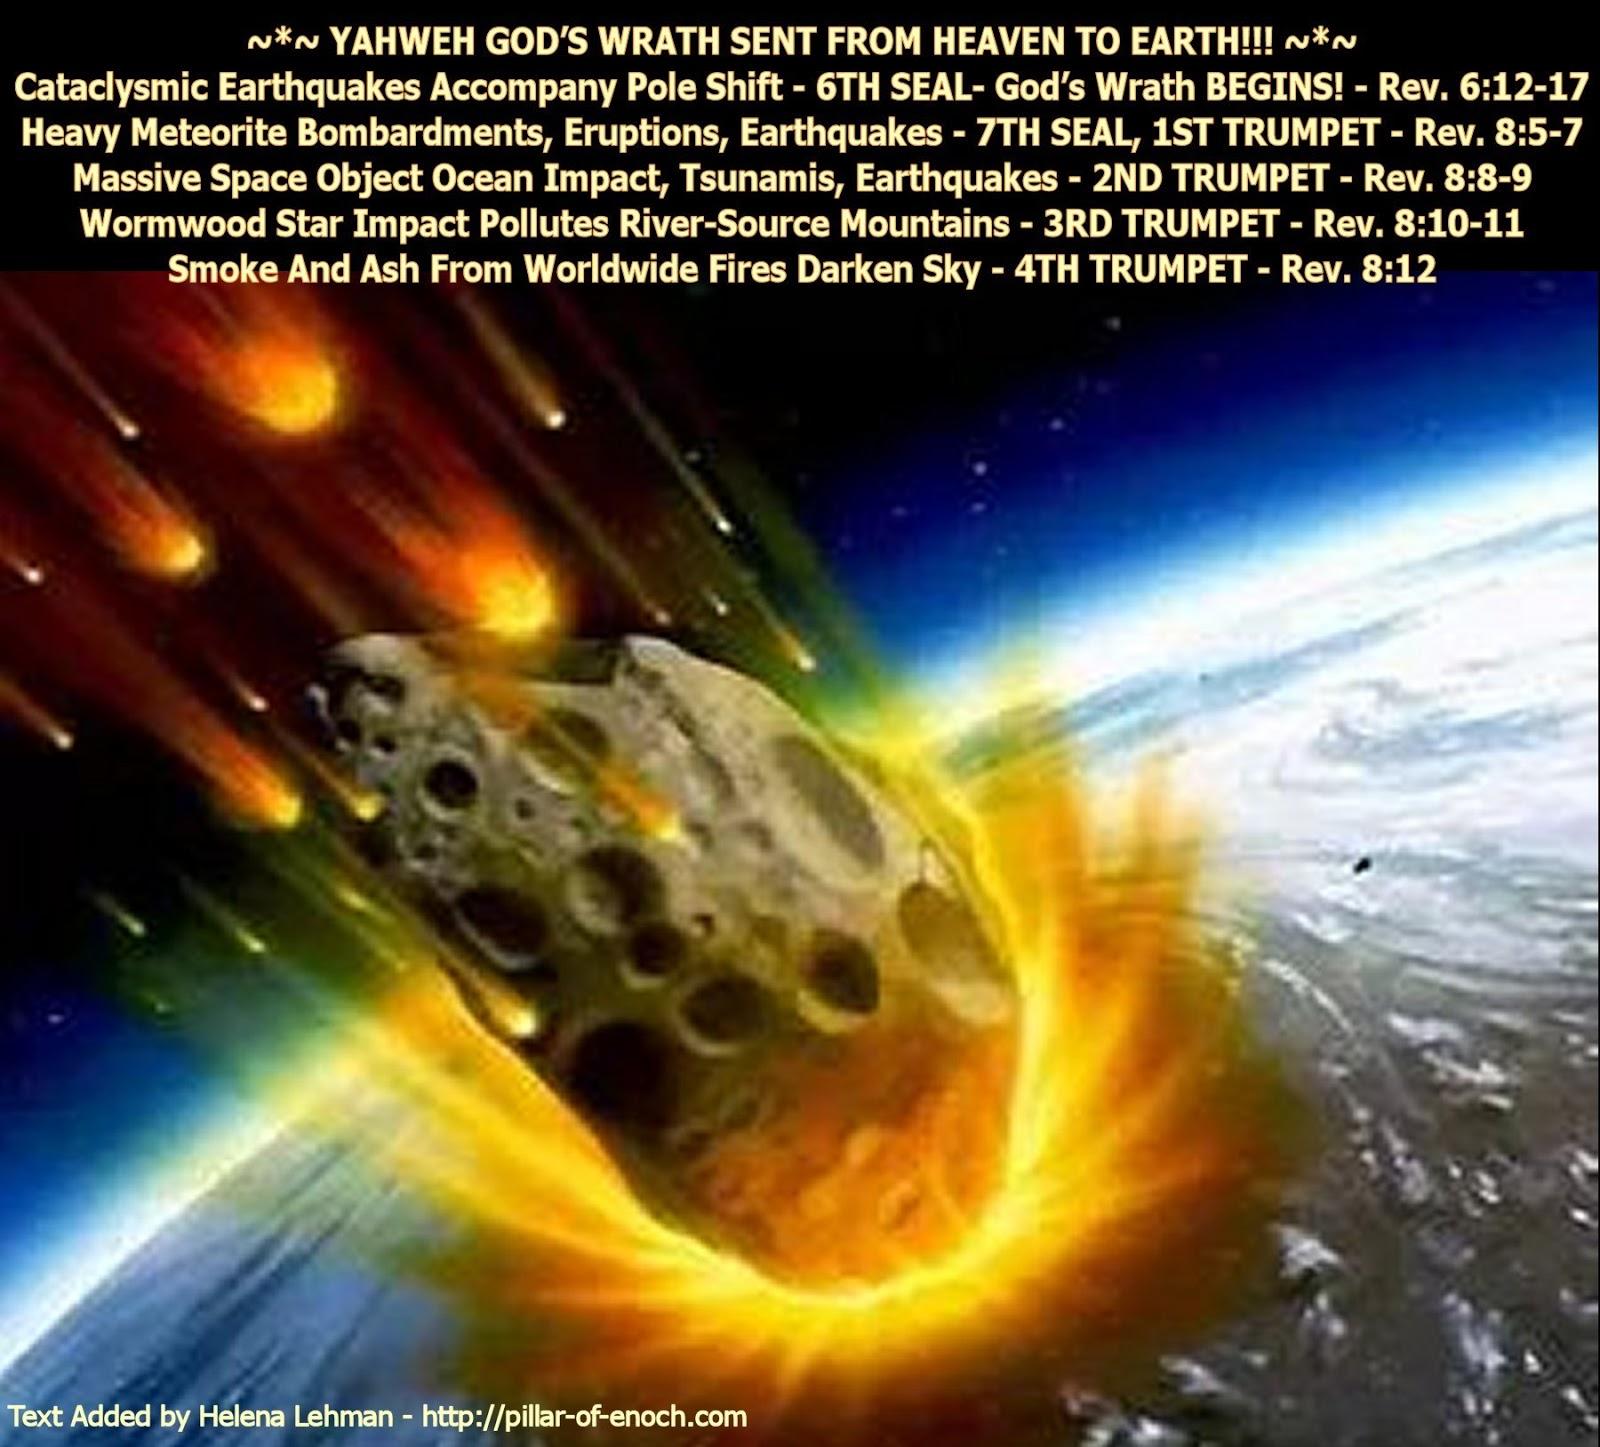 Gods-Wrath-From-Heaven_Rev-6-thru-8